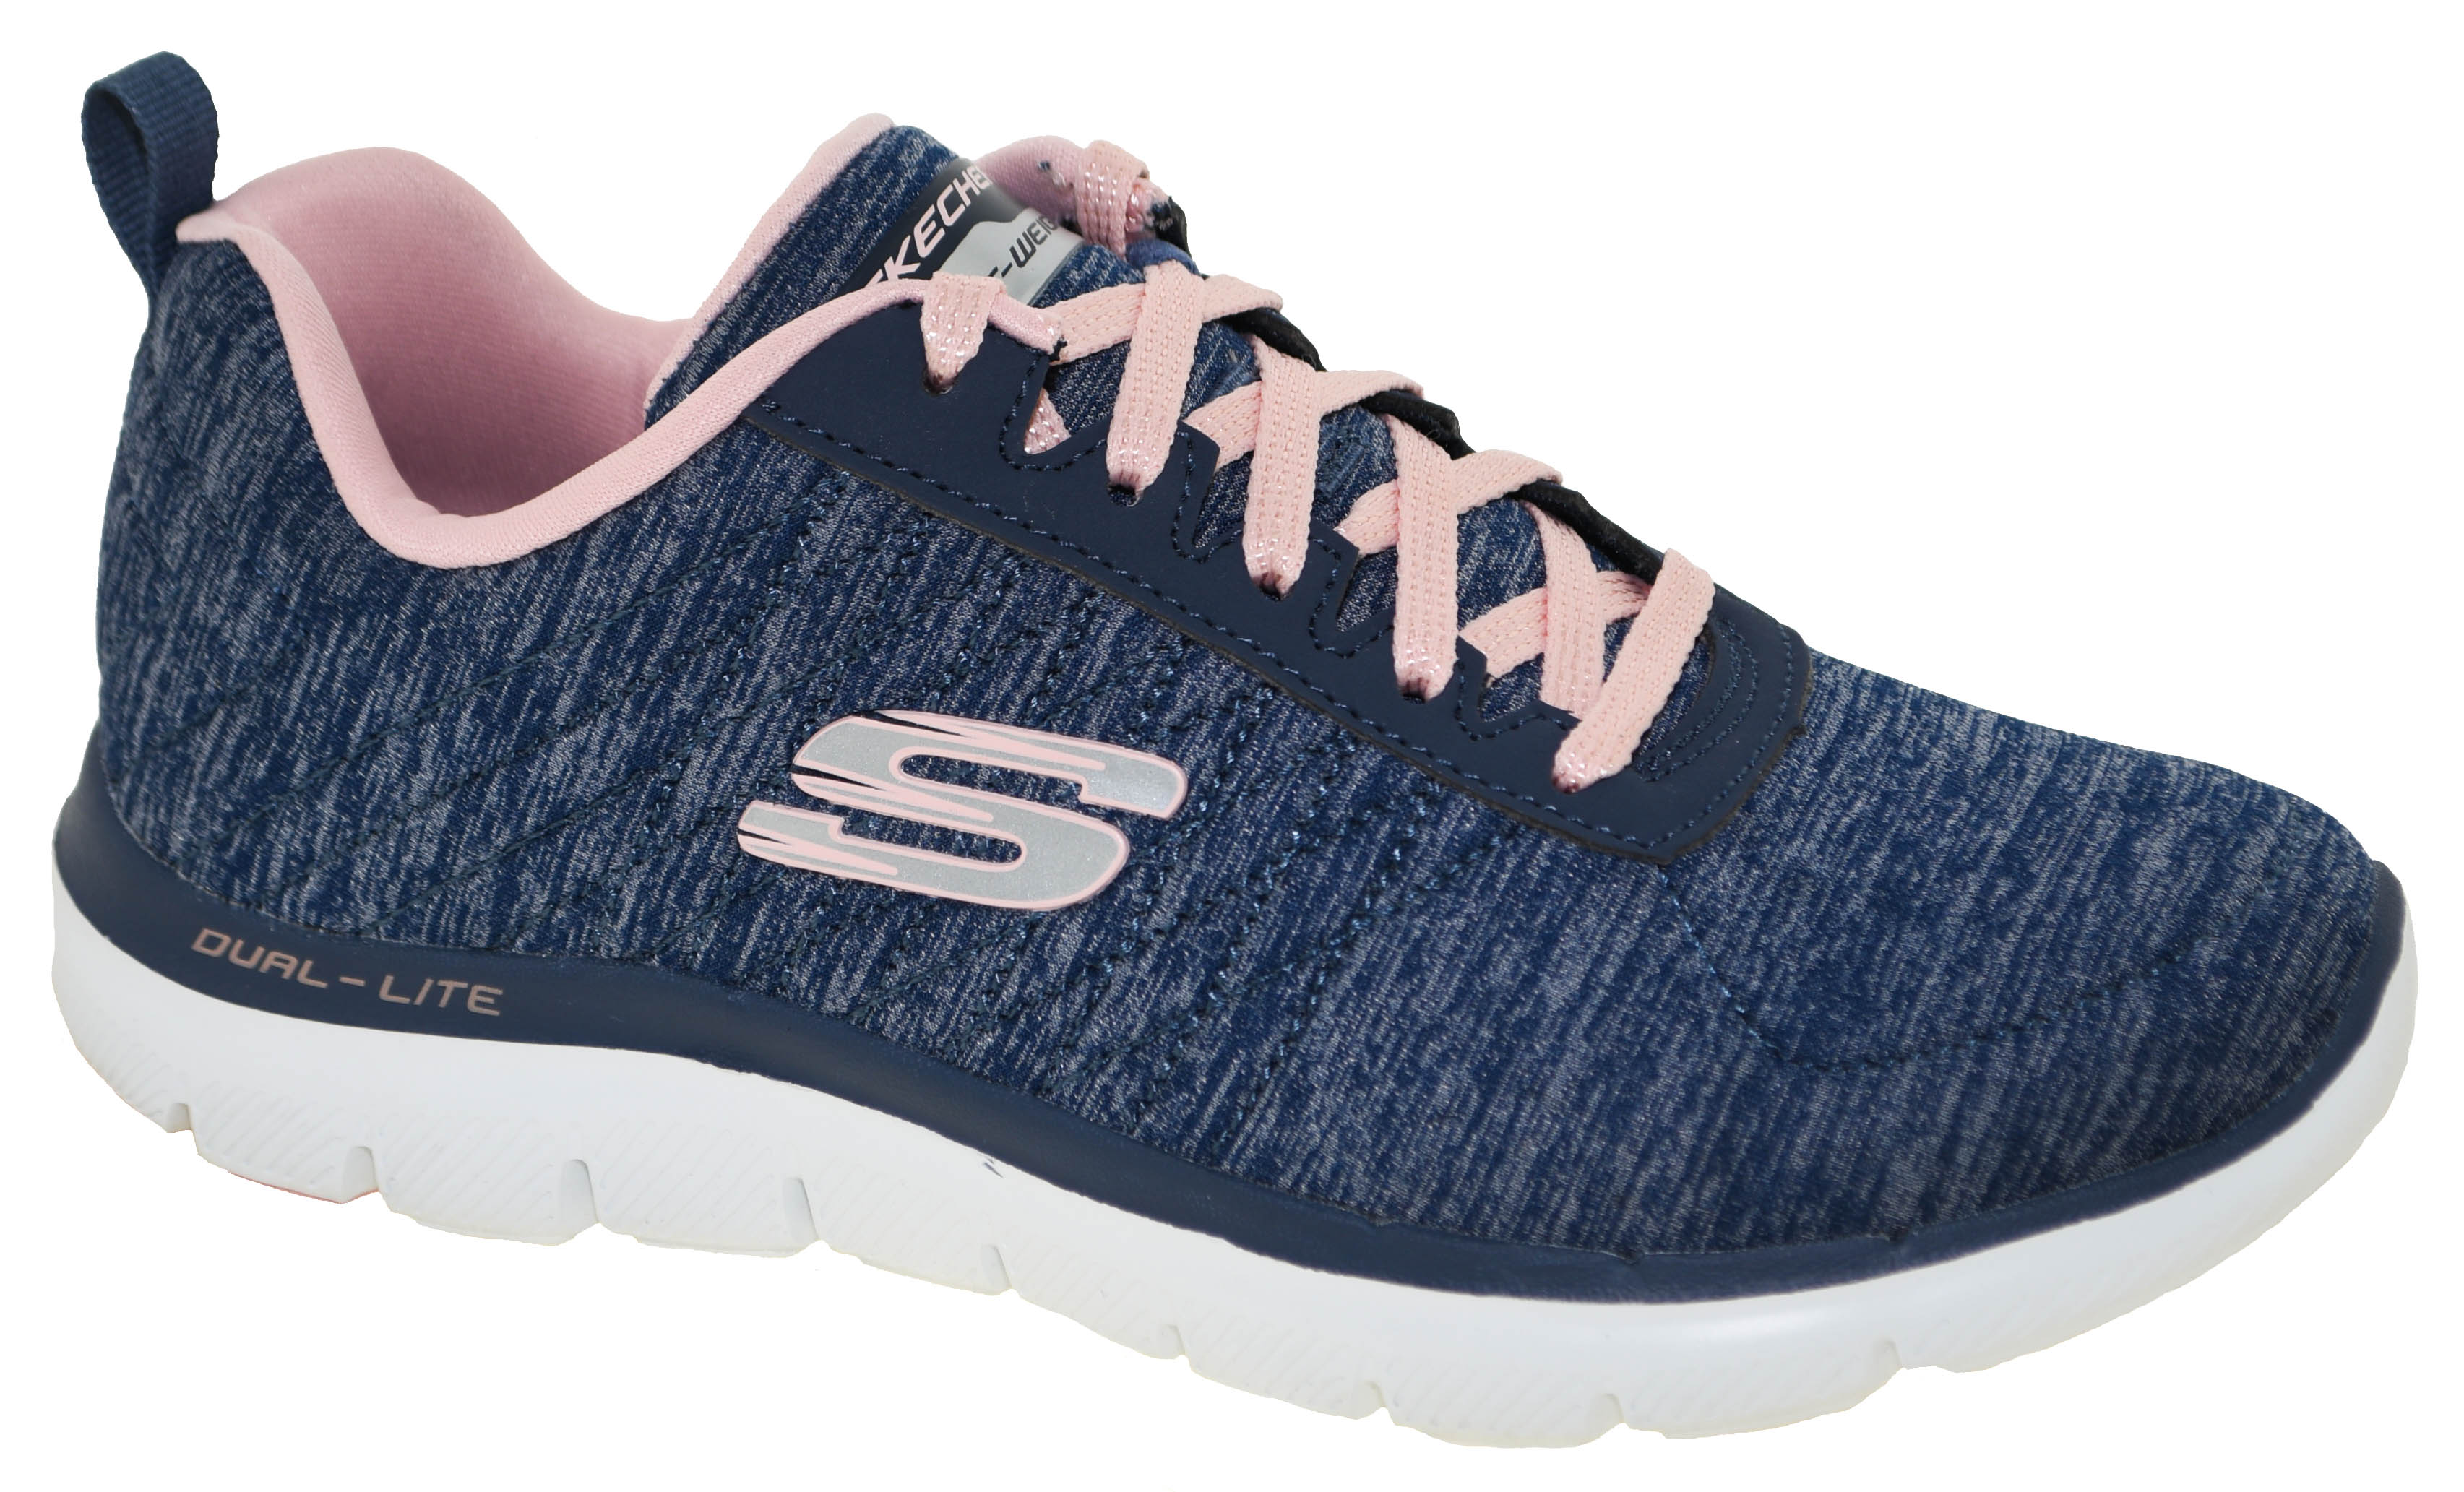 Details about Women's Skechers FLEX APPEAL 2.0 12753NVY NavyPink Shoes